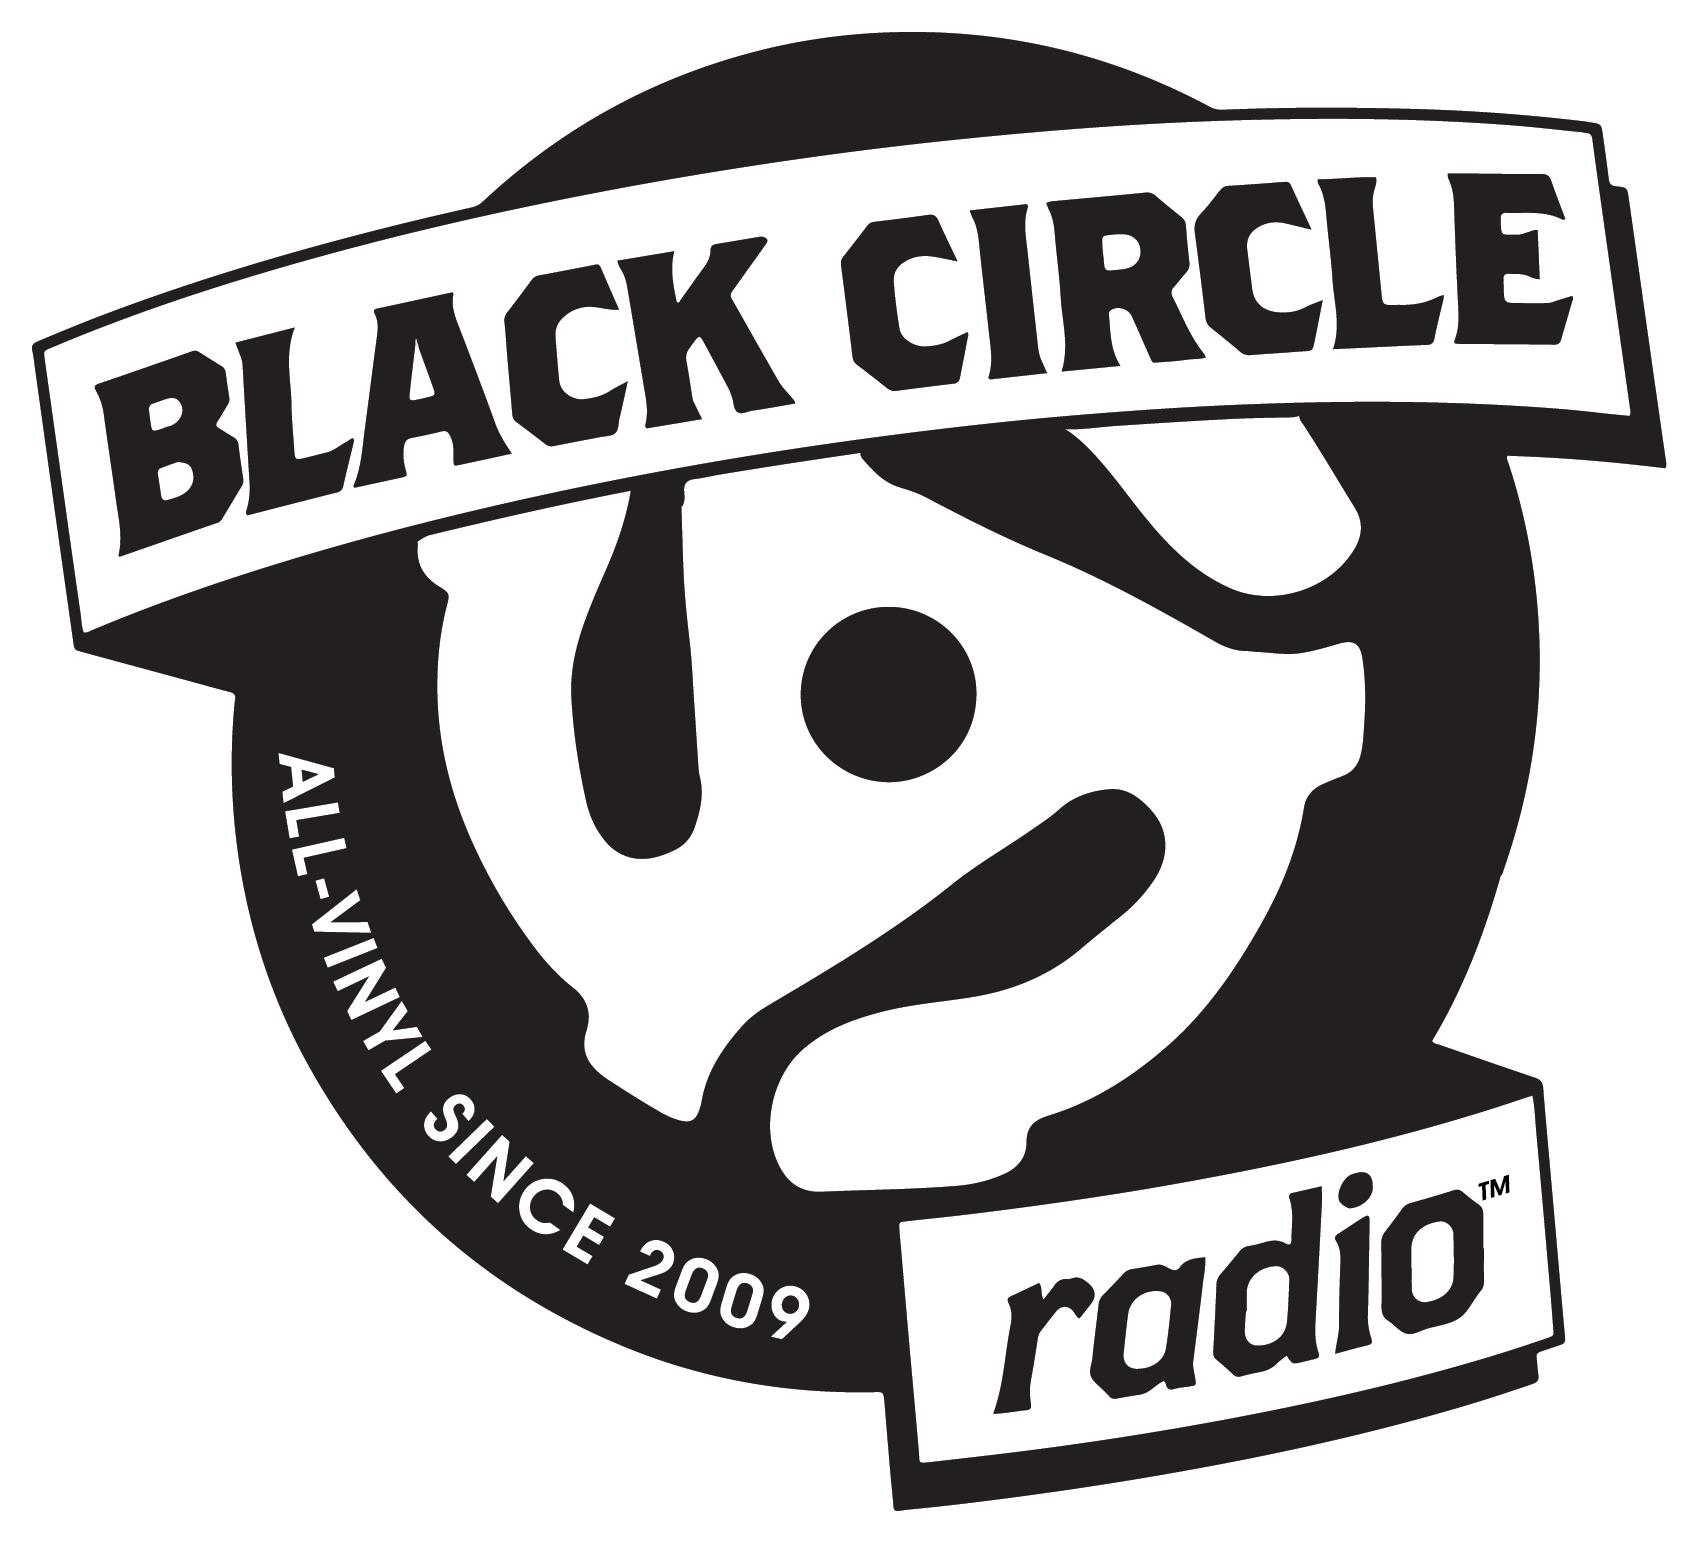 Black Circle Radio